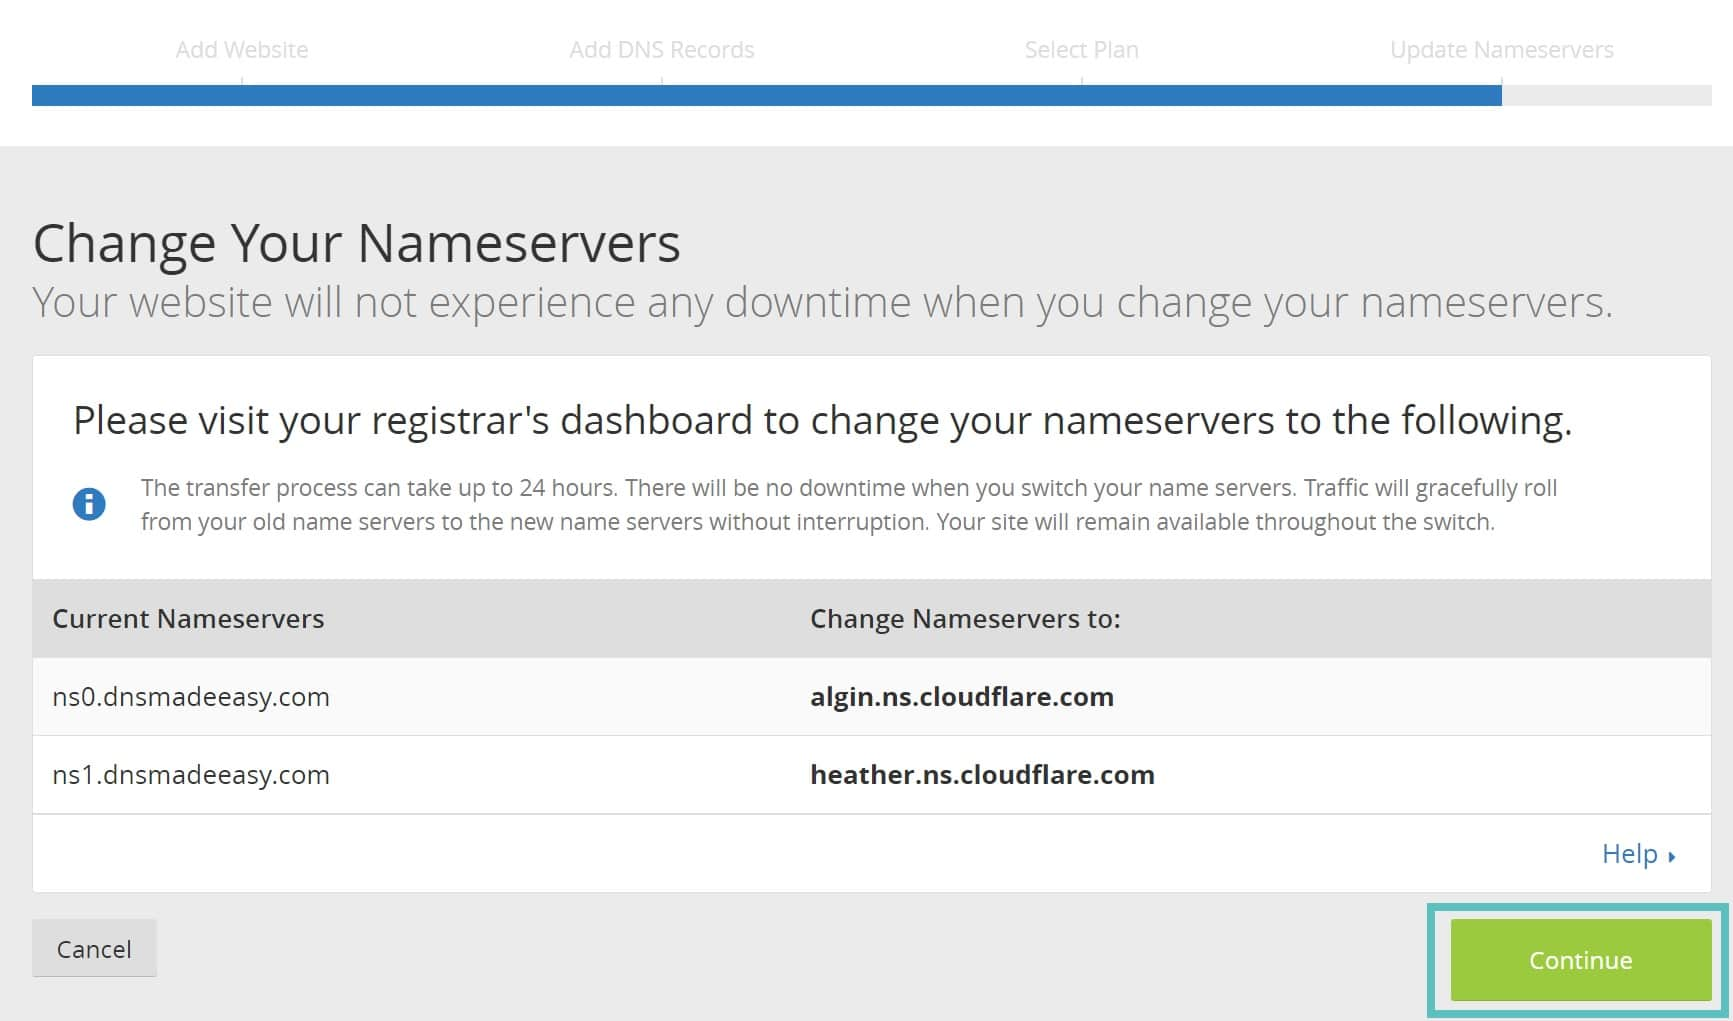 Server dei nomi Cloudflare